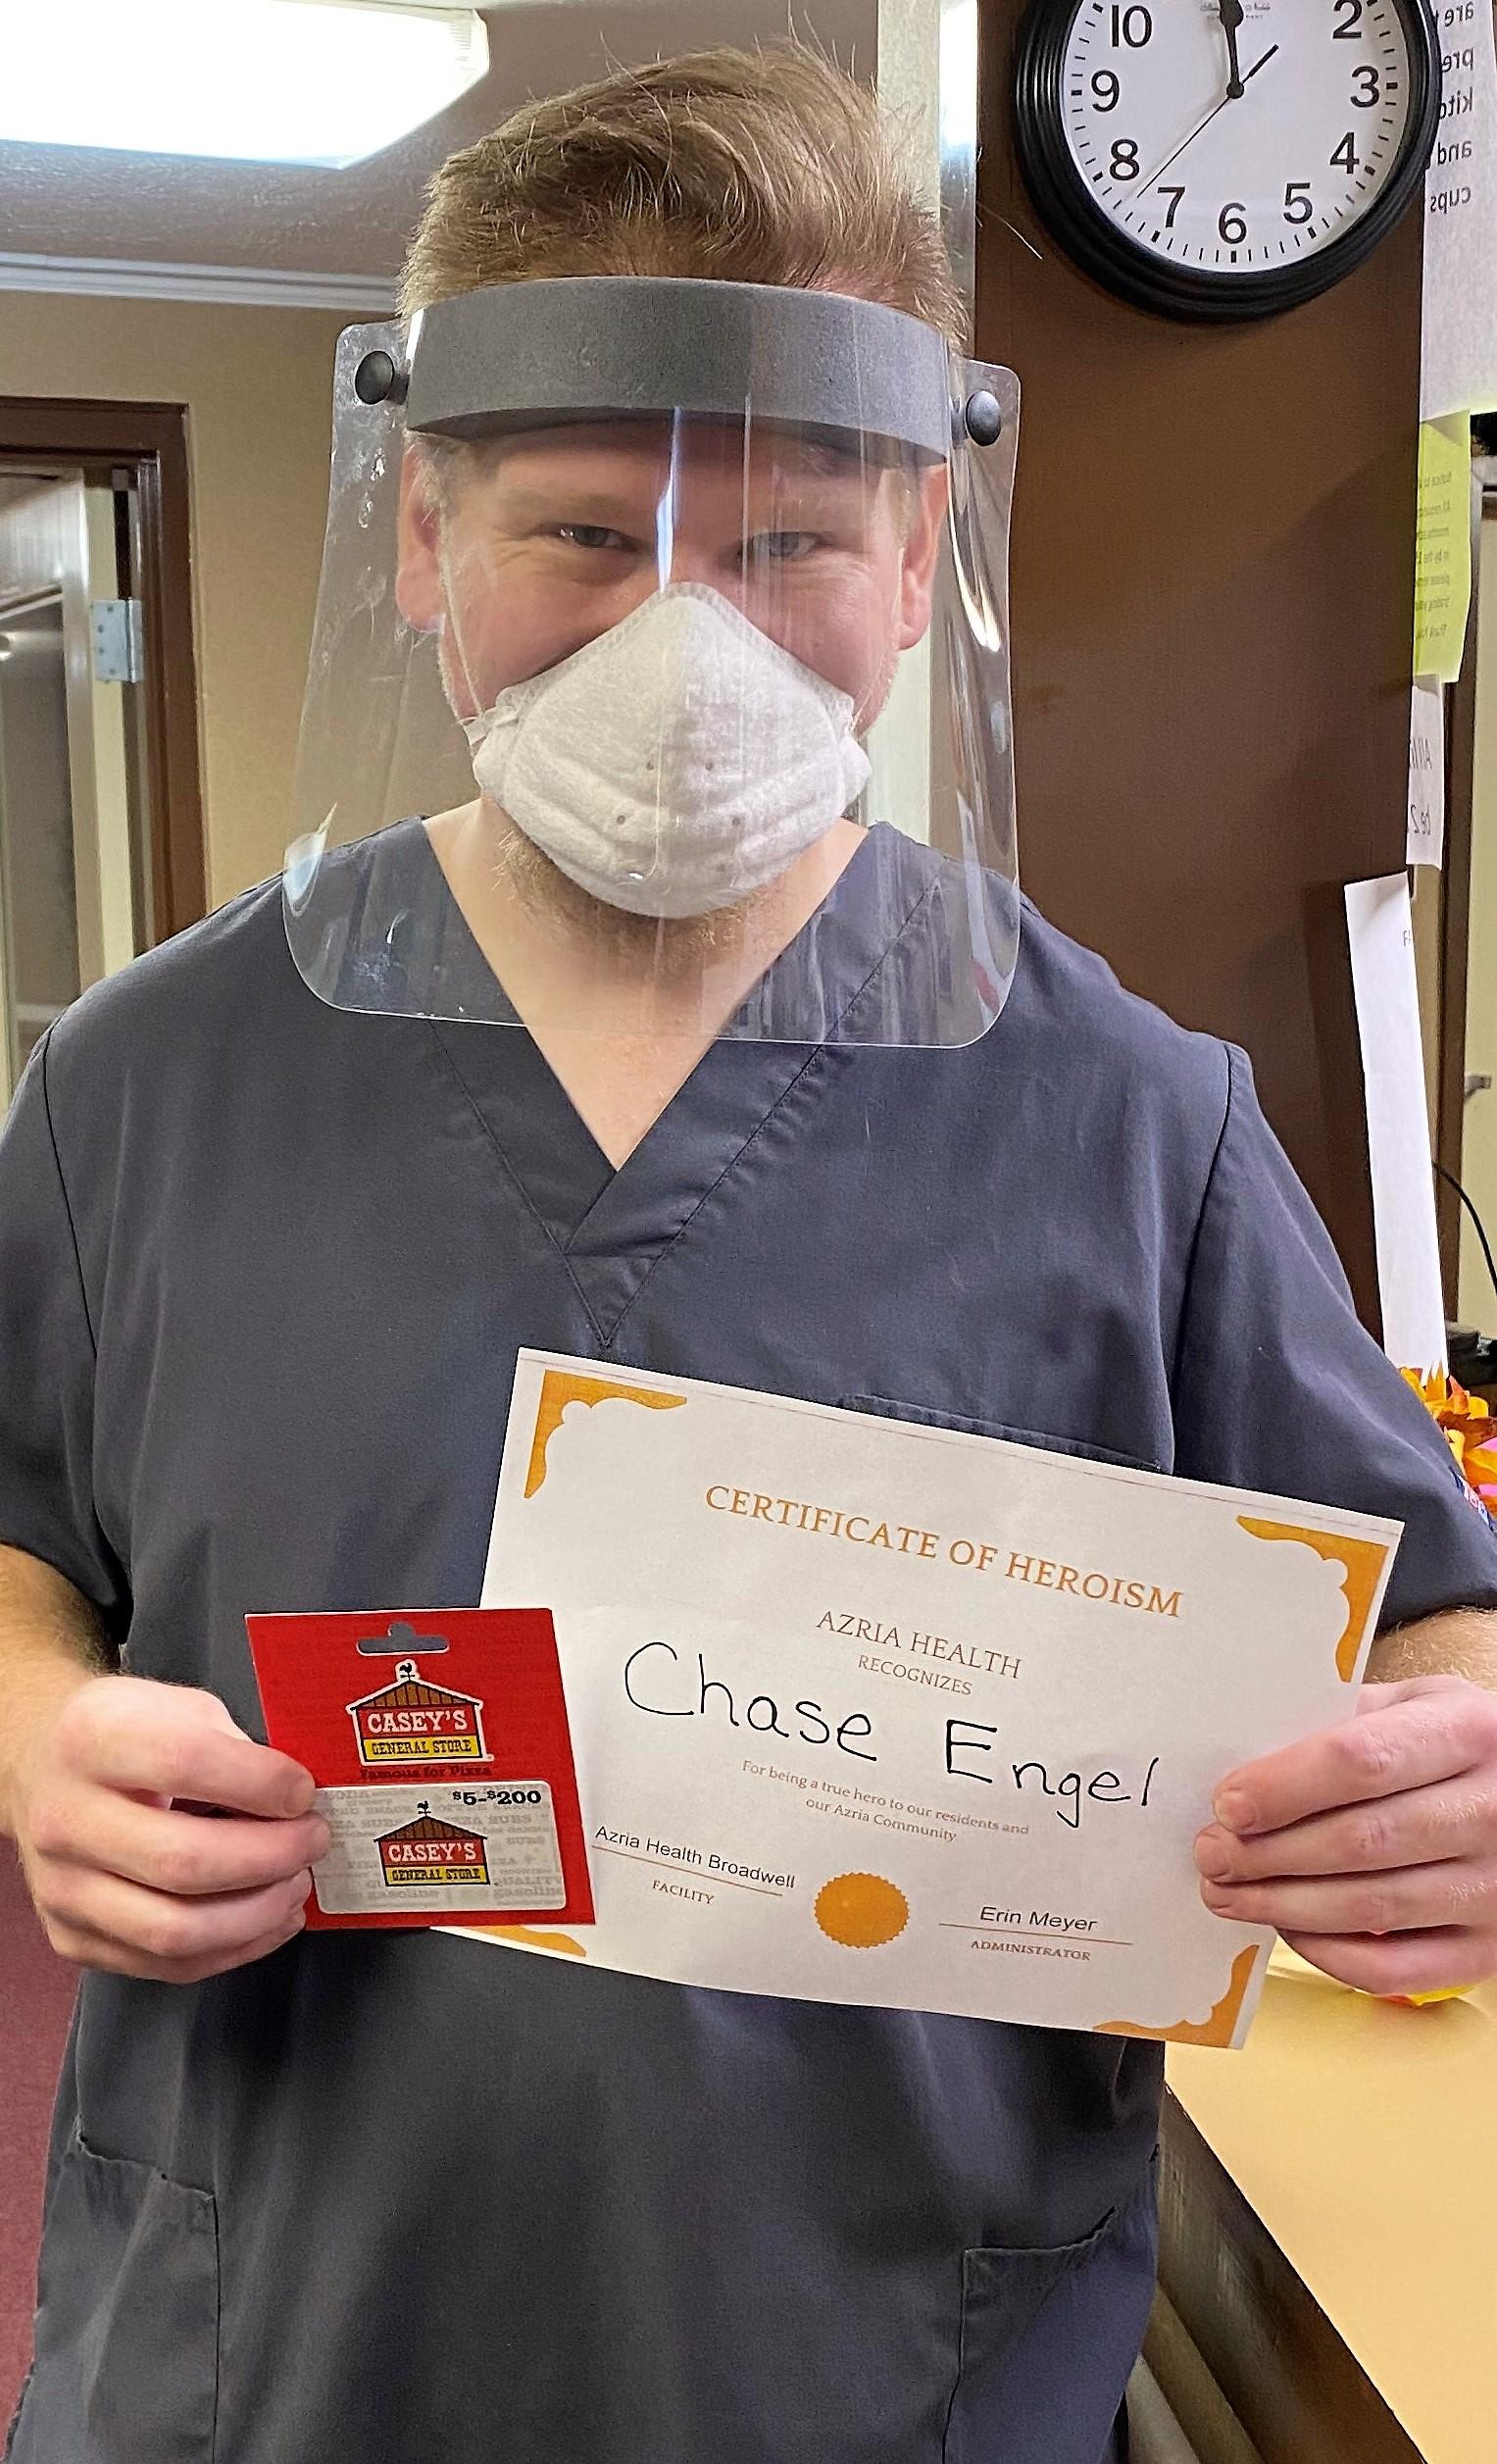 Chase Engel